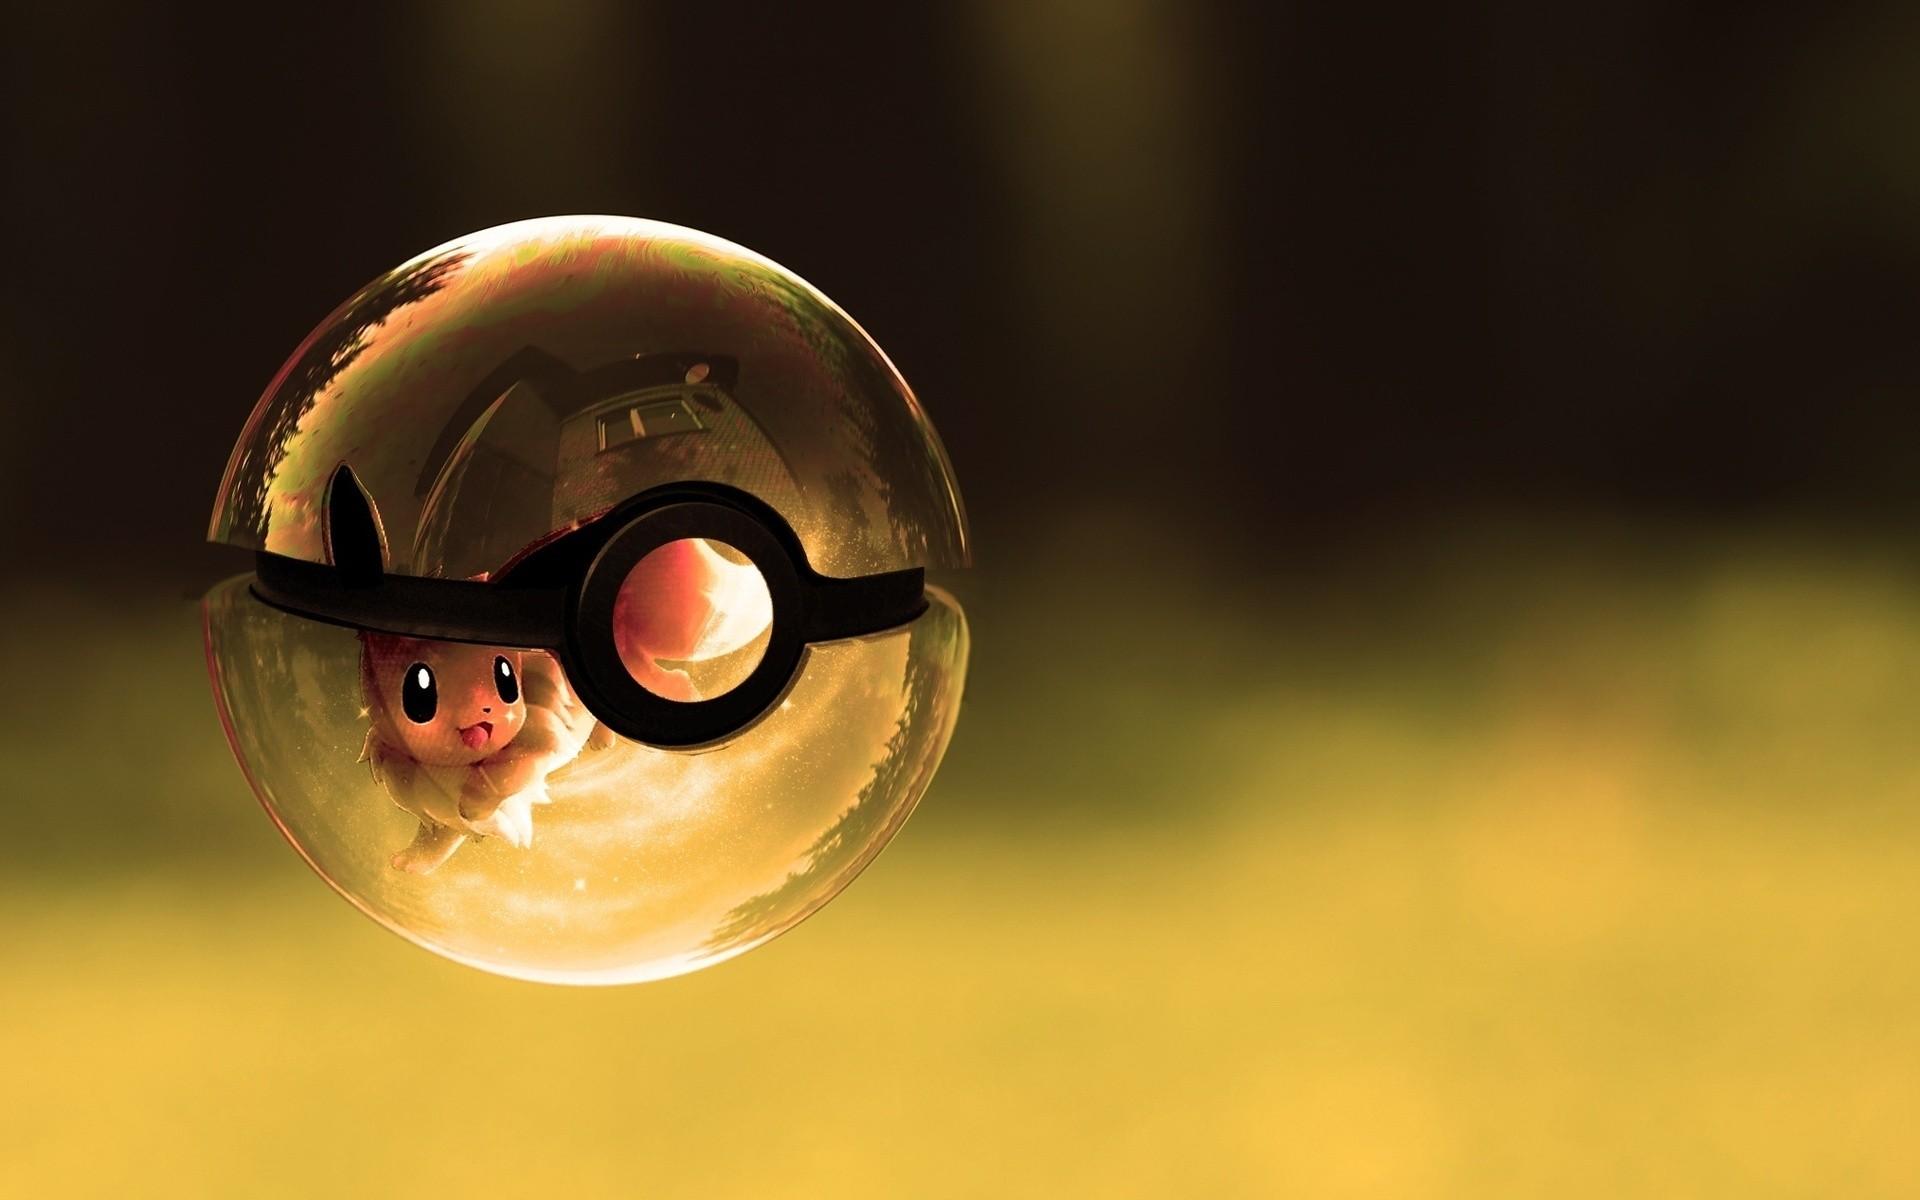 Pokemon poke balls eevee artwork wallpaper 1920x1200 8559 1920x1200